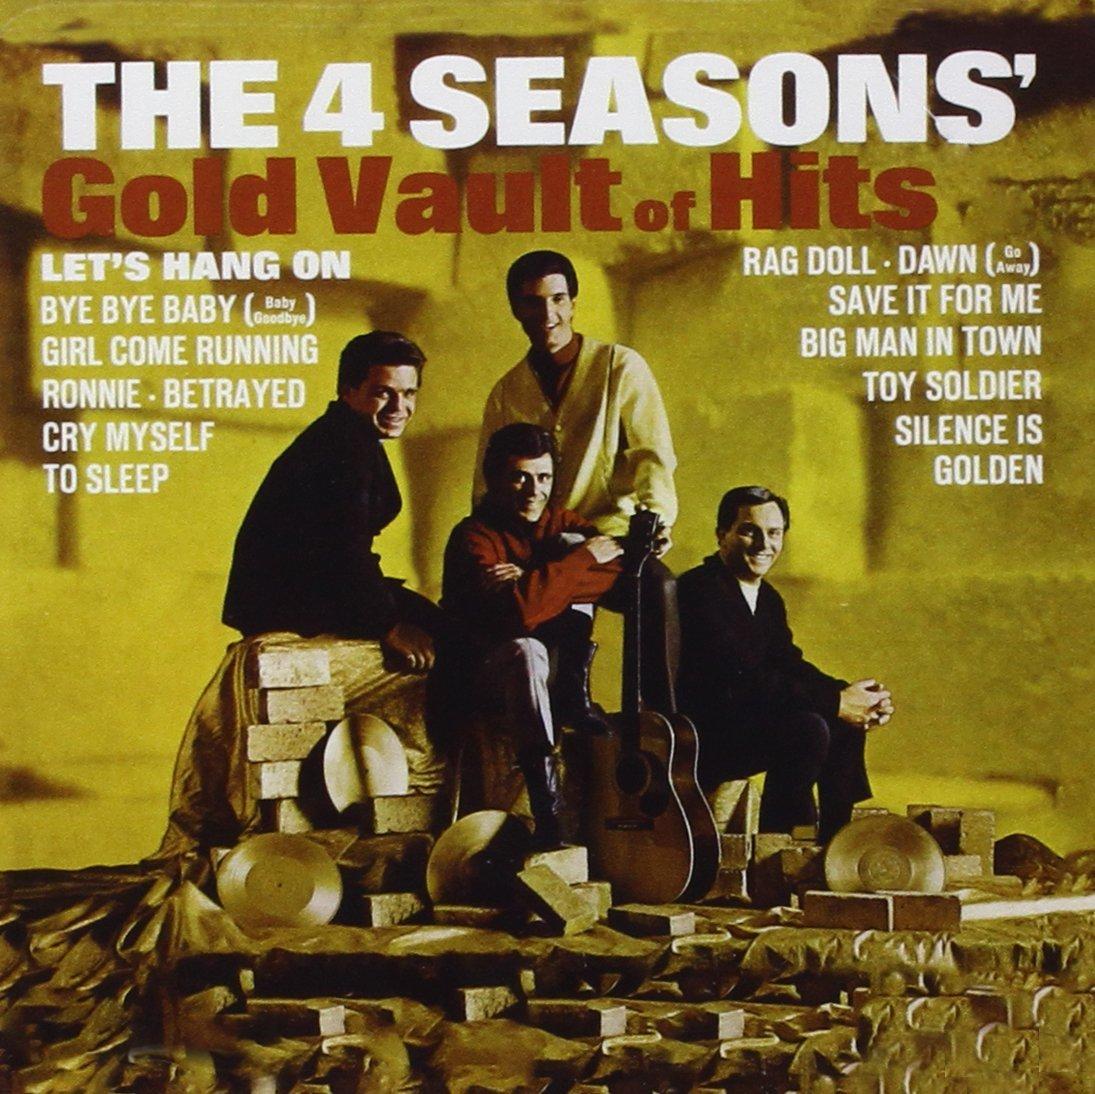 Rock On Vinyl The 4 Seasons